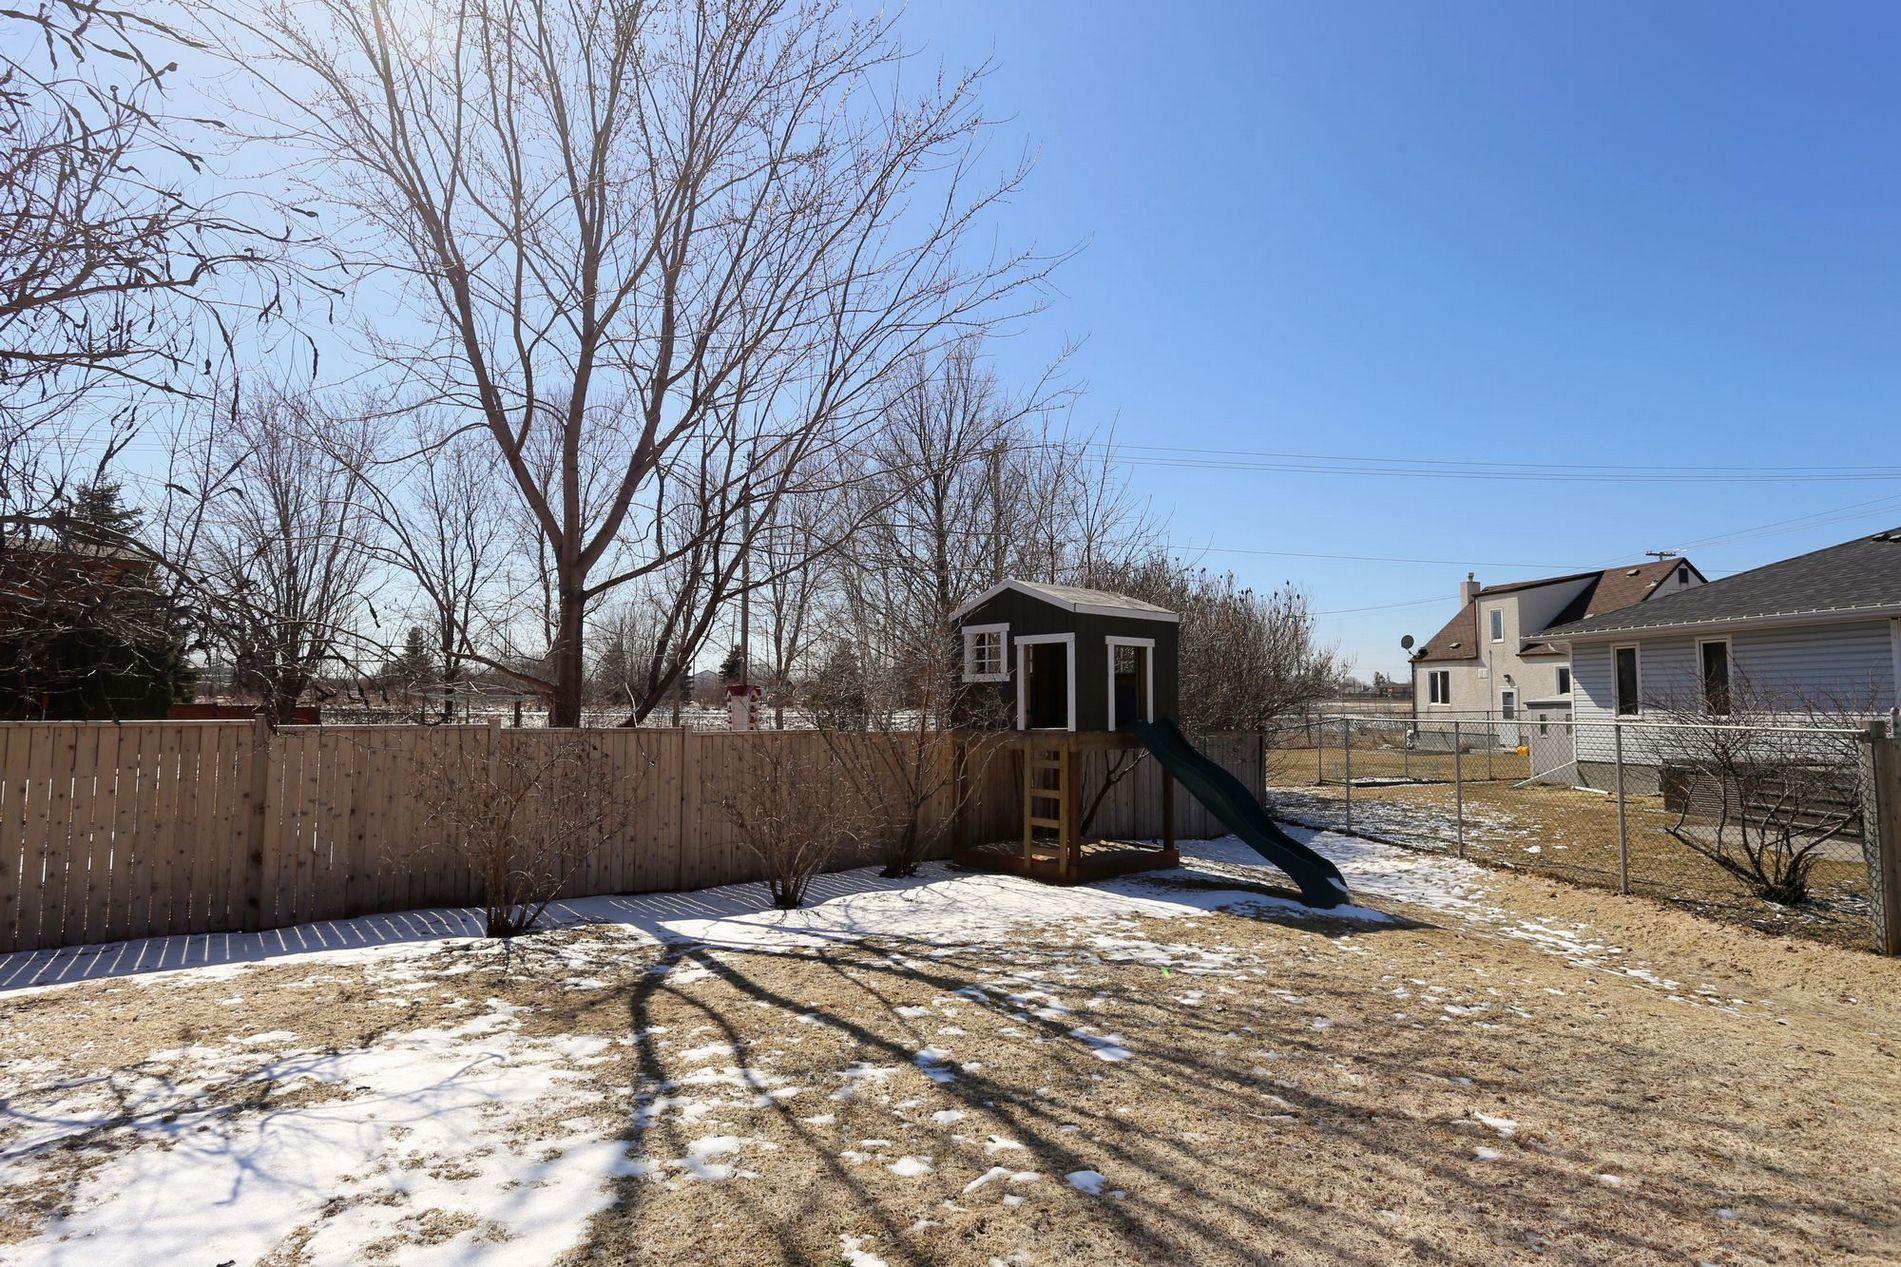 108 Coopman Crescent, Winnipeg, Manitoba  R3R 3T7 - Photo 24 - 1607903